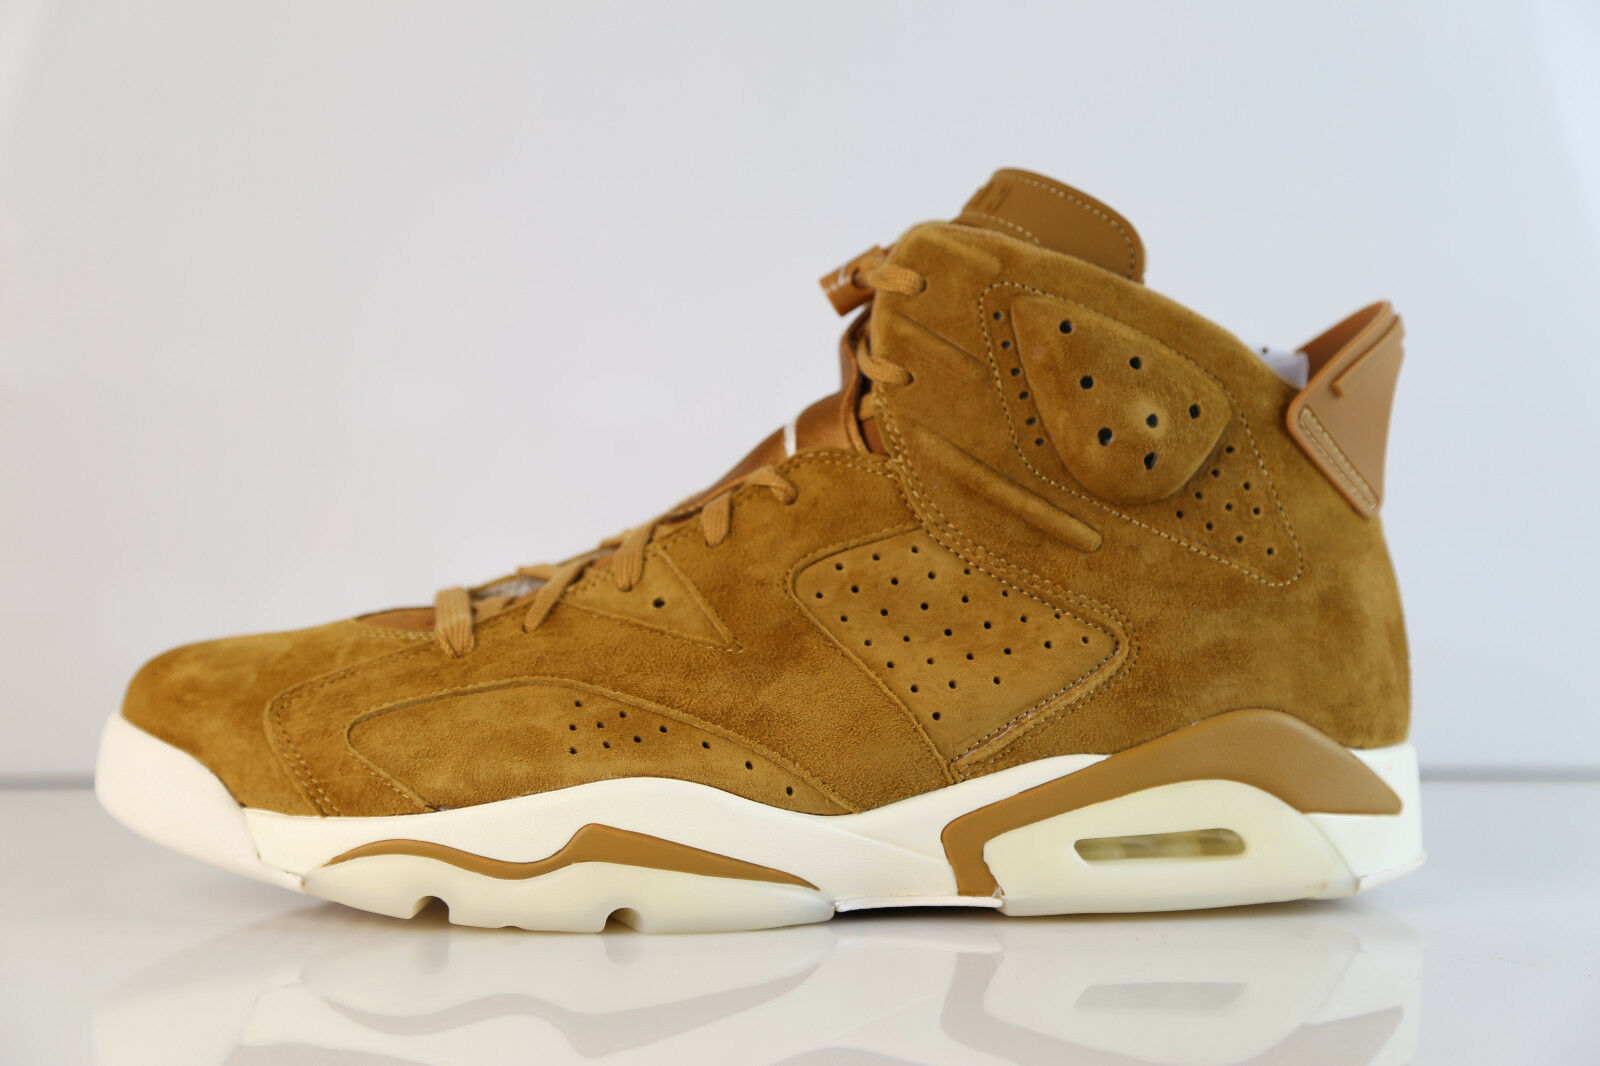 Nike Air Jordan Retro 6 Golden Harvest Wheat Suede 384664-705 8-12 5 7 1